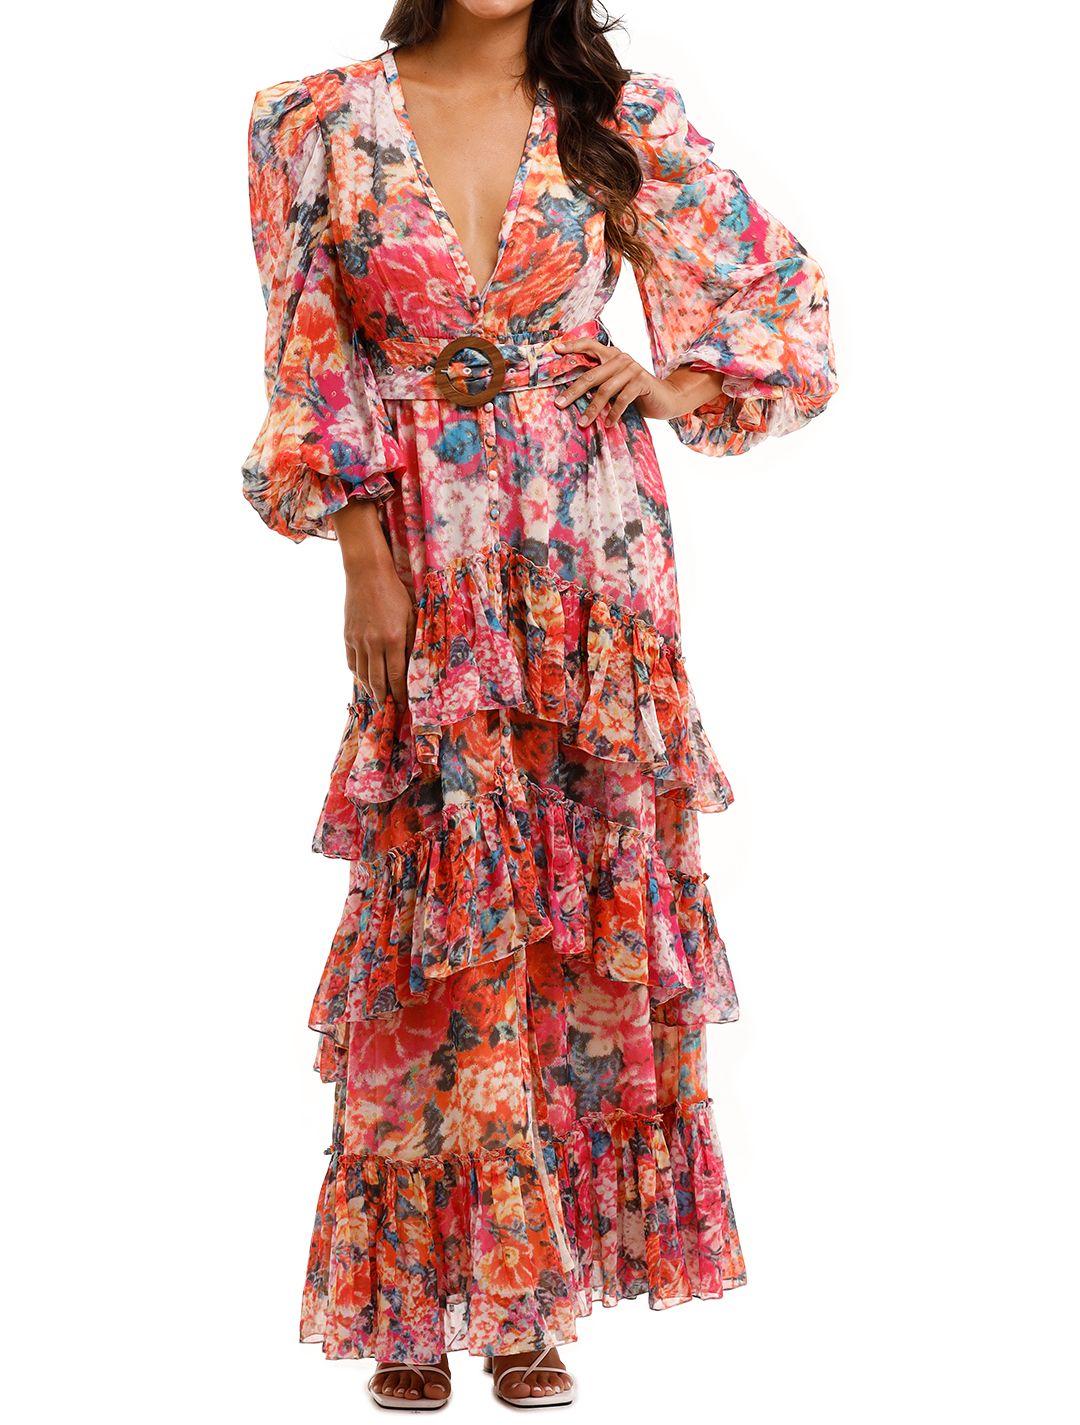 Rococo Sand Peony Maxi Dress V neckline